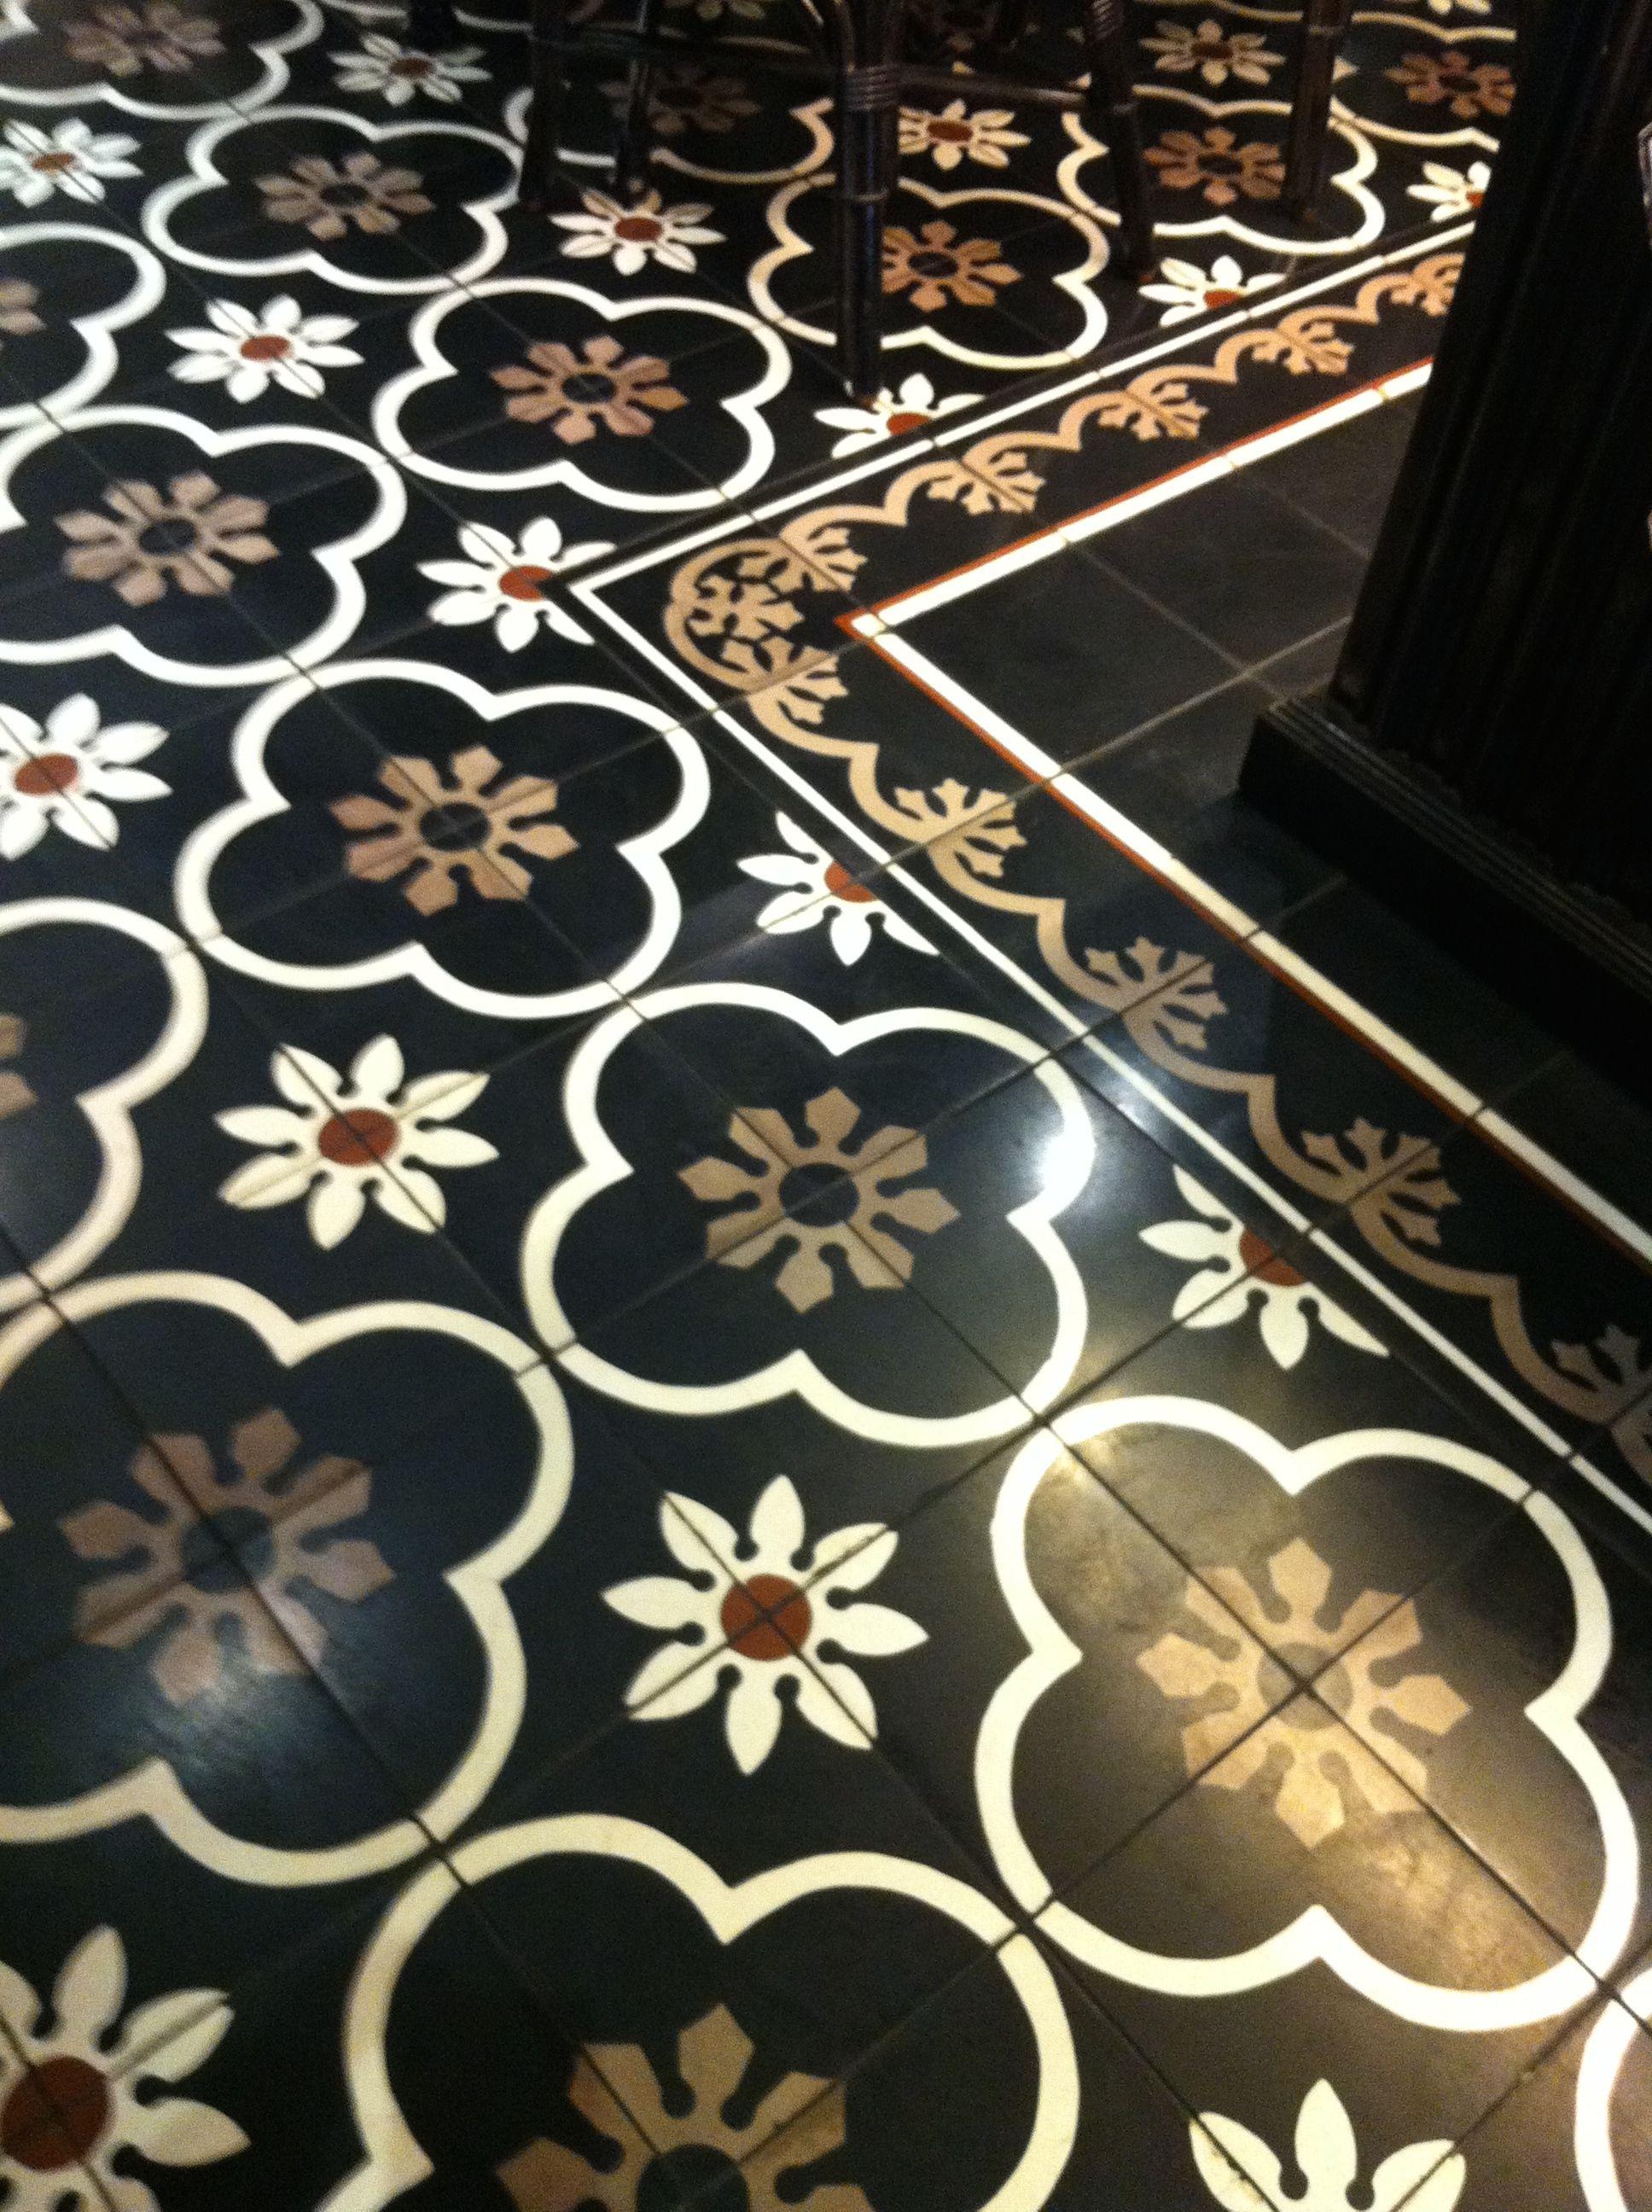 Tile floor ps cafe singapore tear sheets home pinterest tile floor ps cafe singapore doublecrazyfo Images